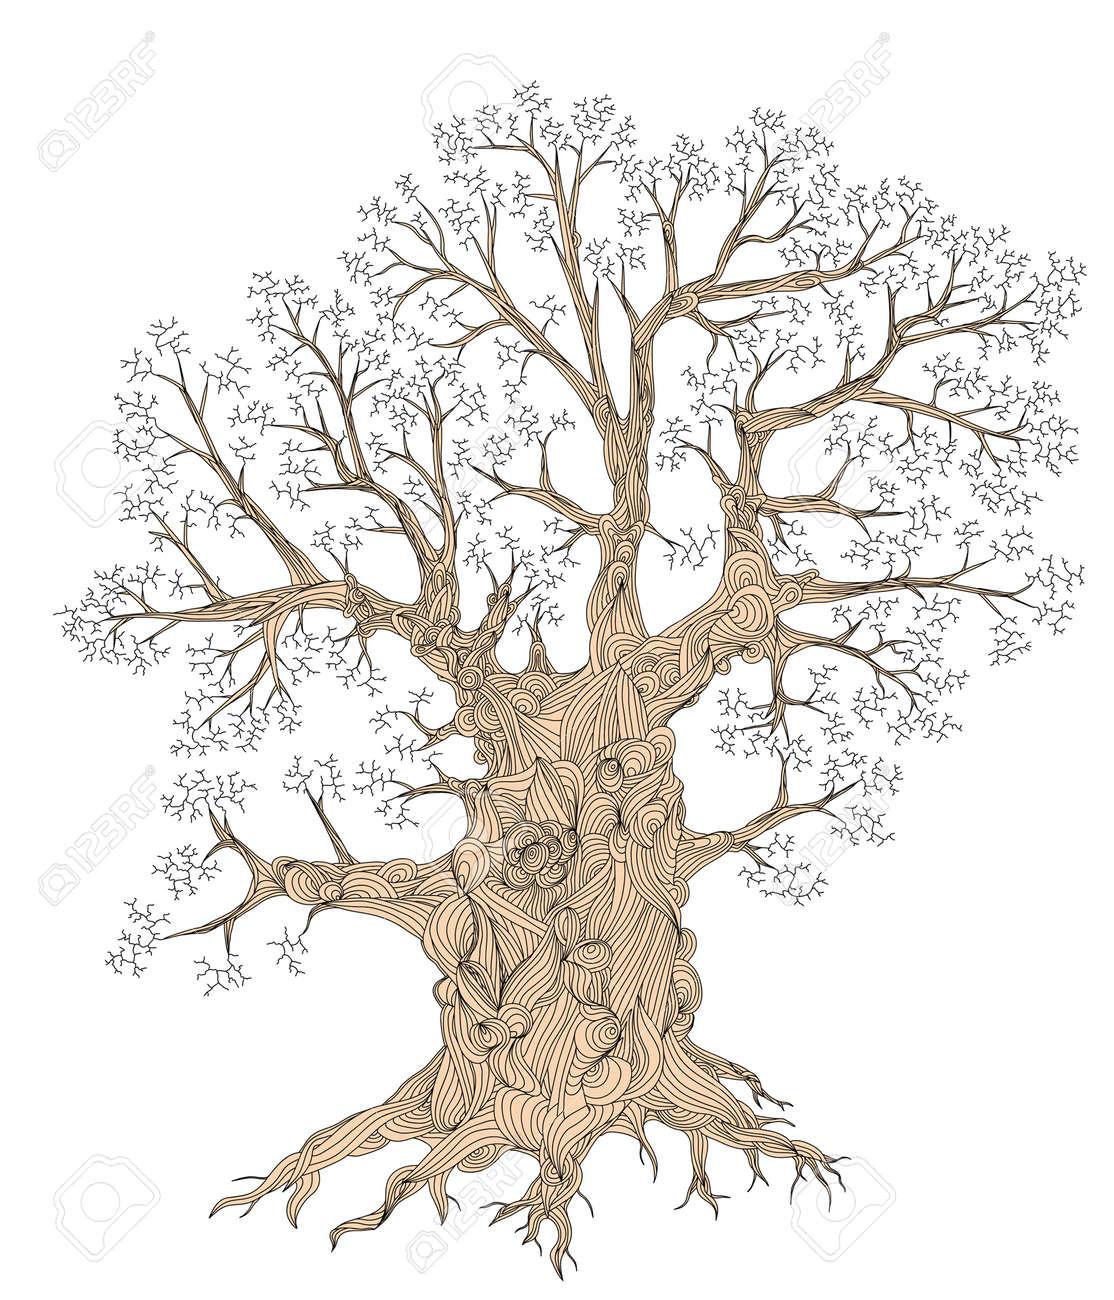 oak tree outline 100 images oak tree icon forest wood sign